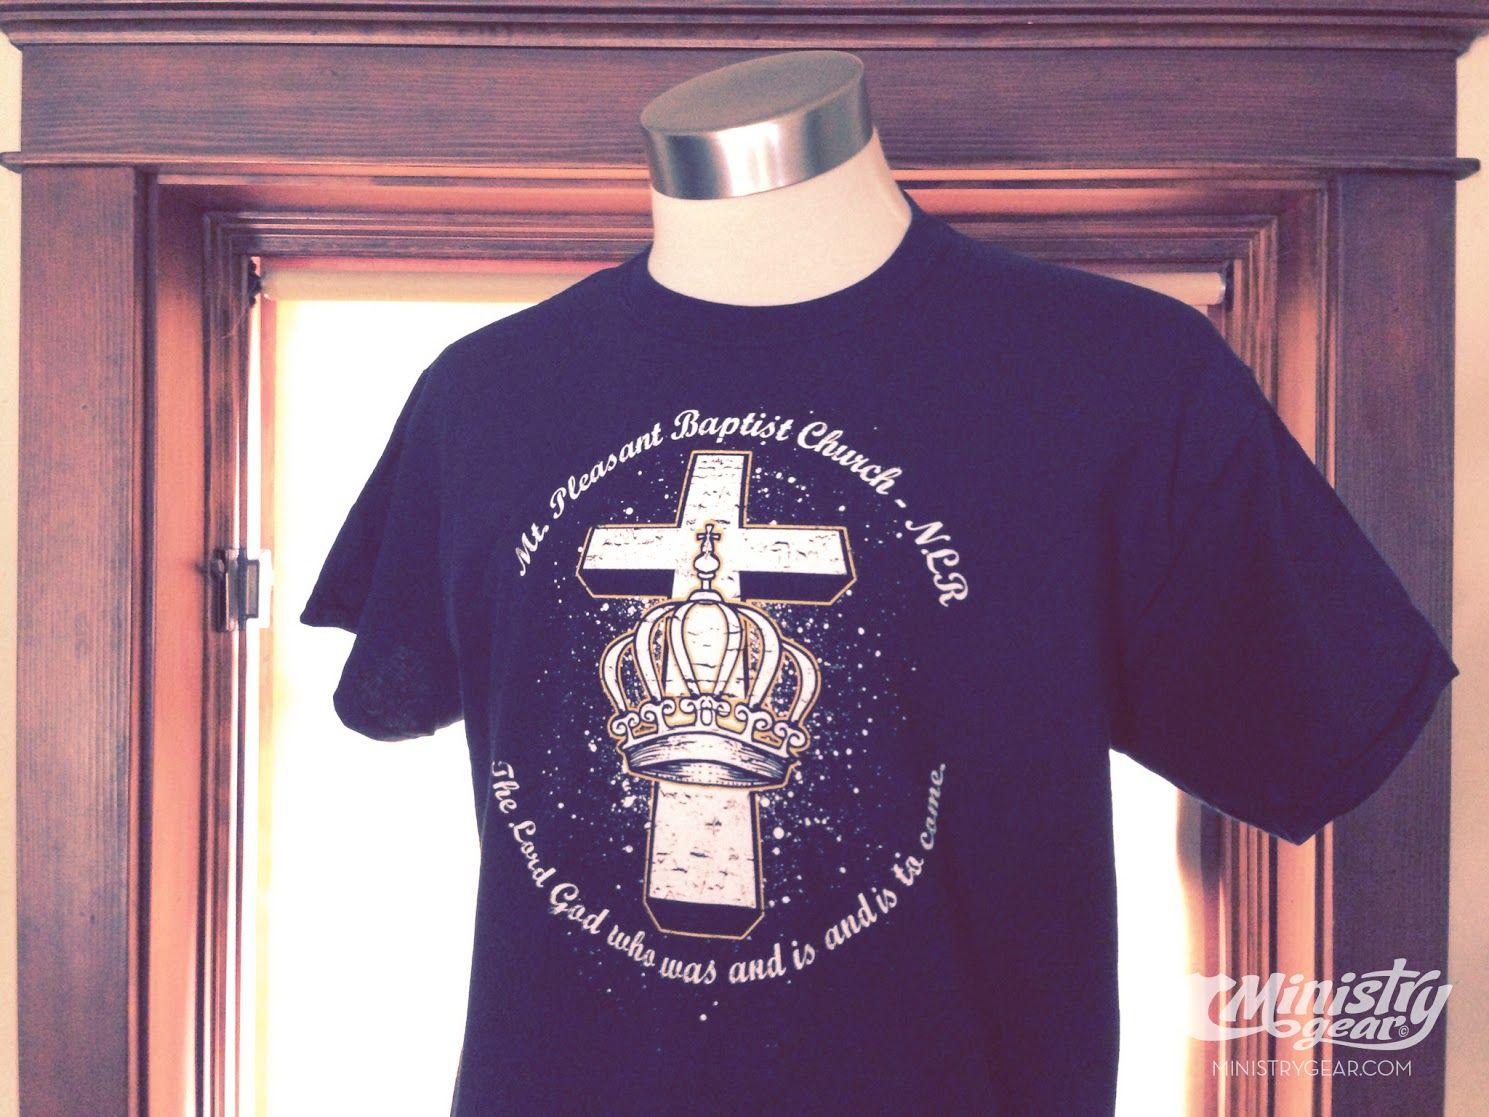 T shirt design youth - Mt Pleasant Baptist Church T Shirt Designs